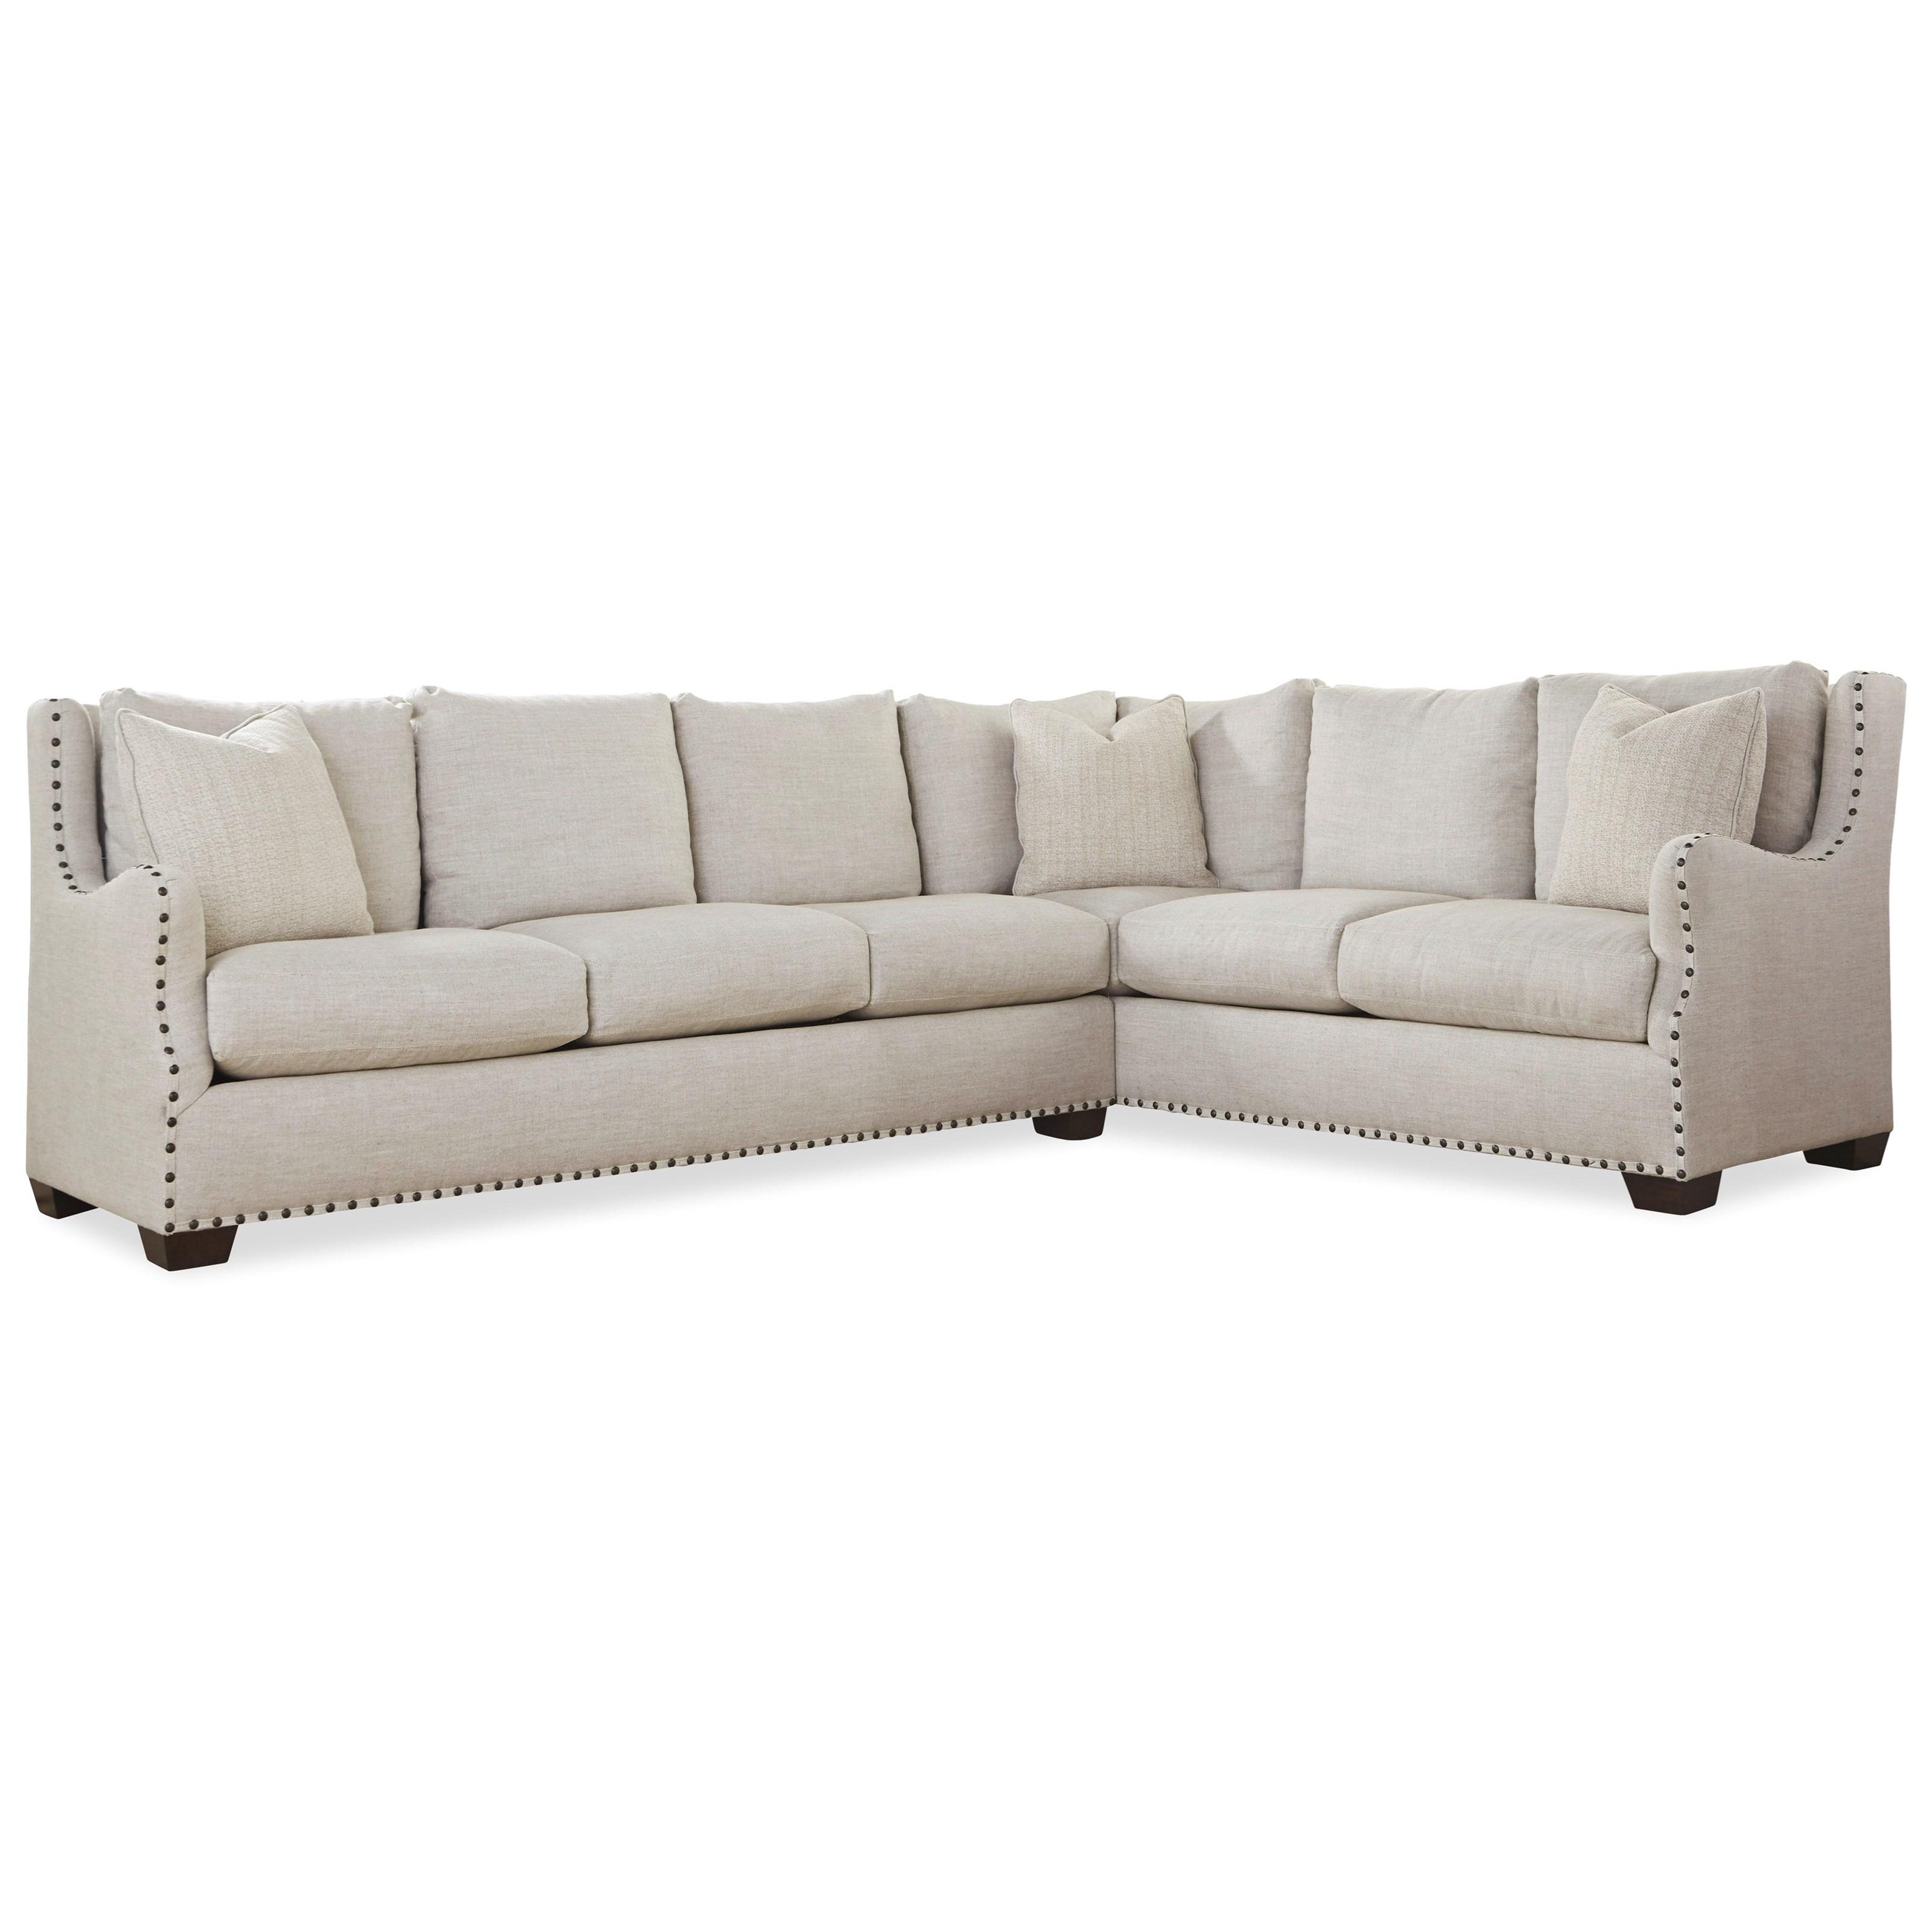 Merveilleux Universal ConnorSectional Sofa ...